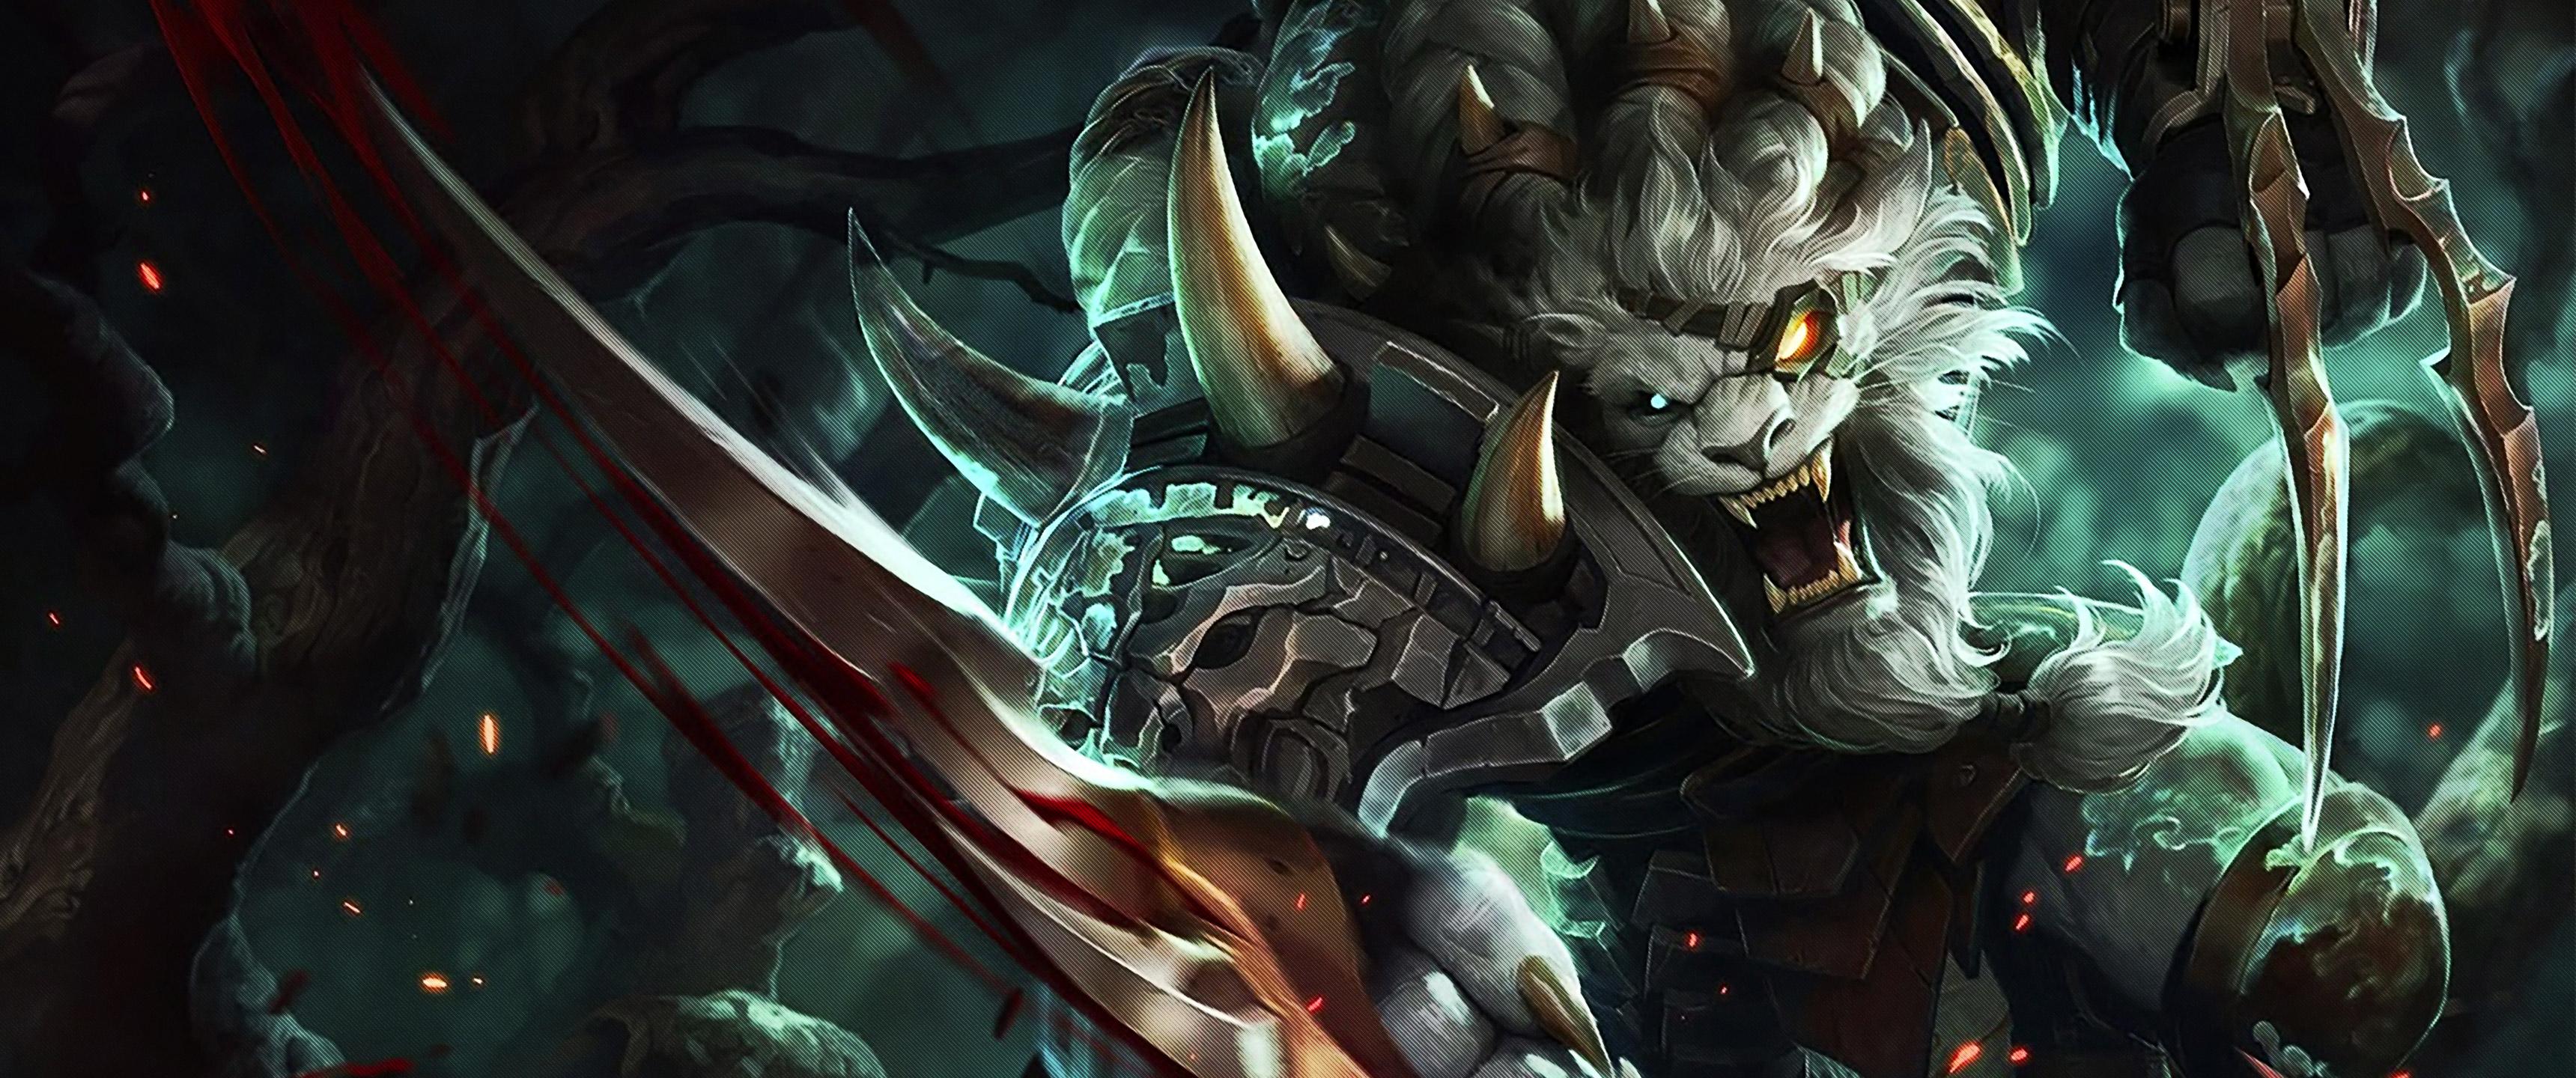 53 Rengar League Of Legends Fondos De Pantalla Hd Fondos